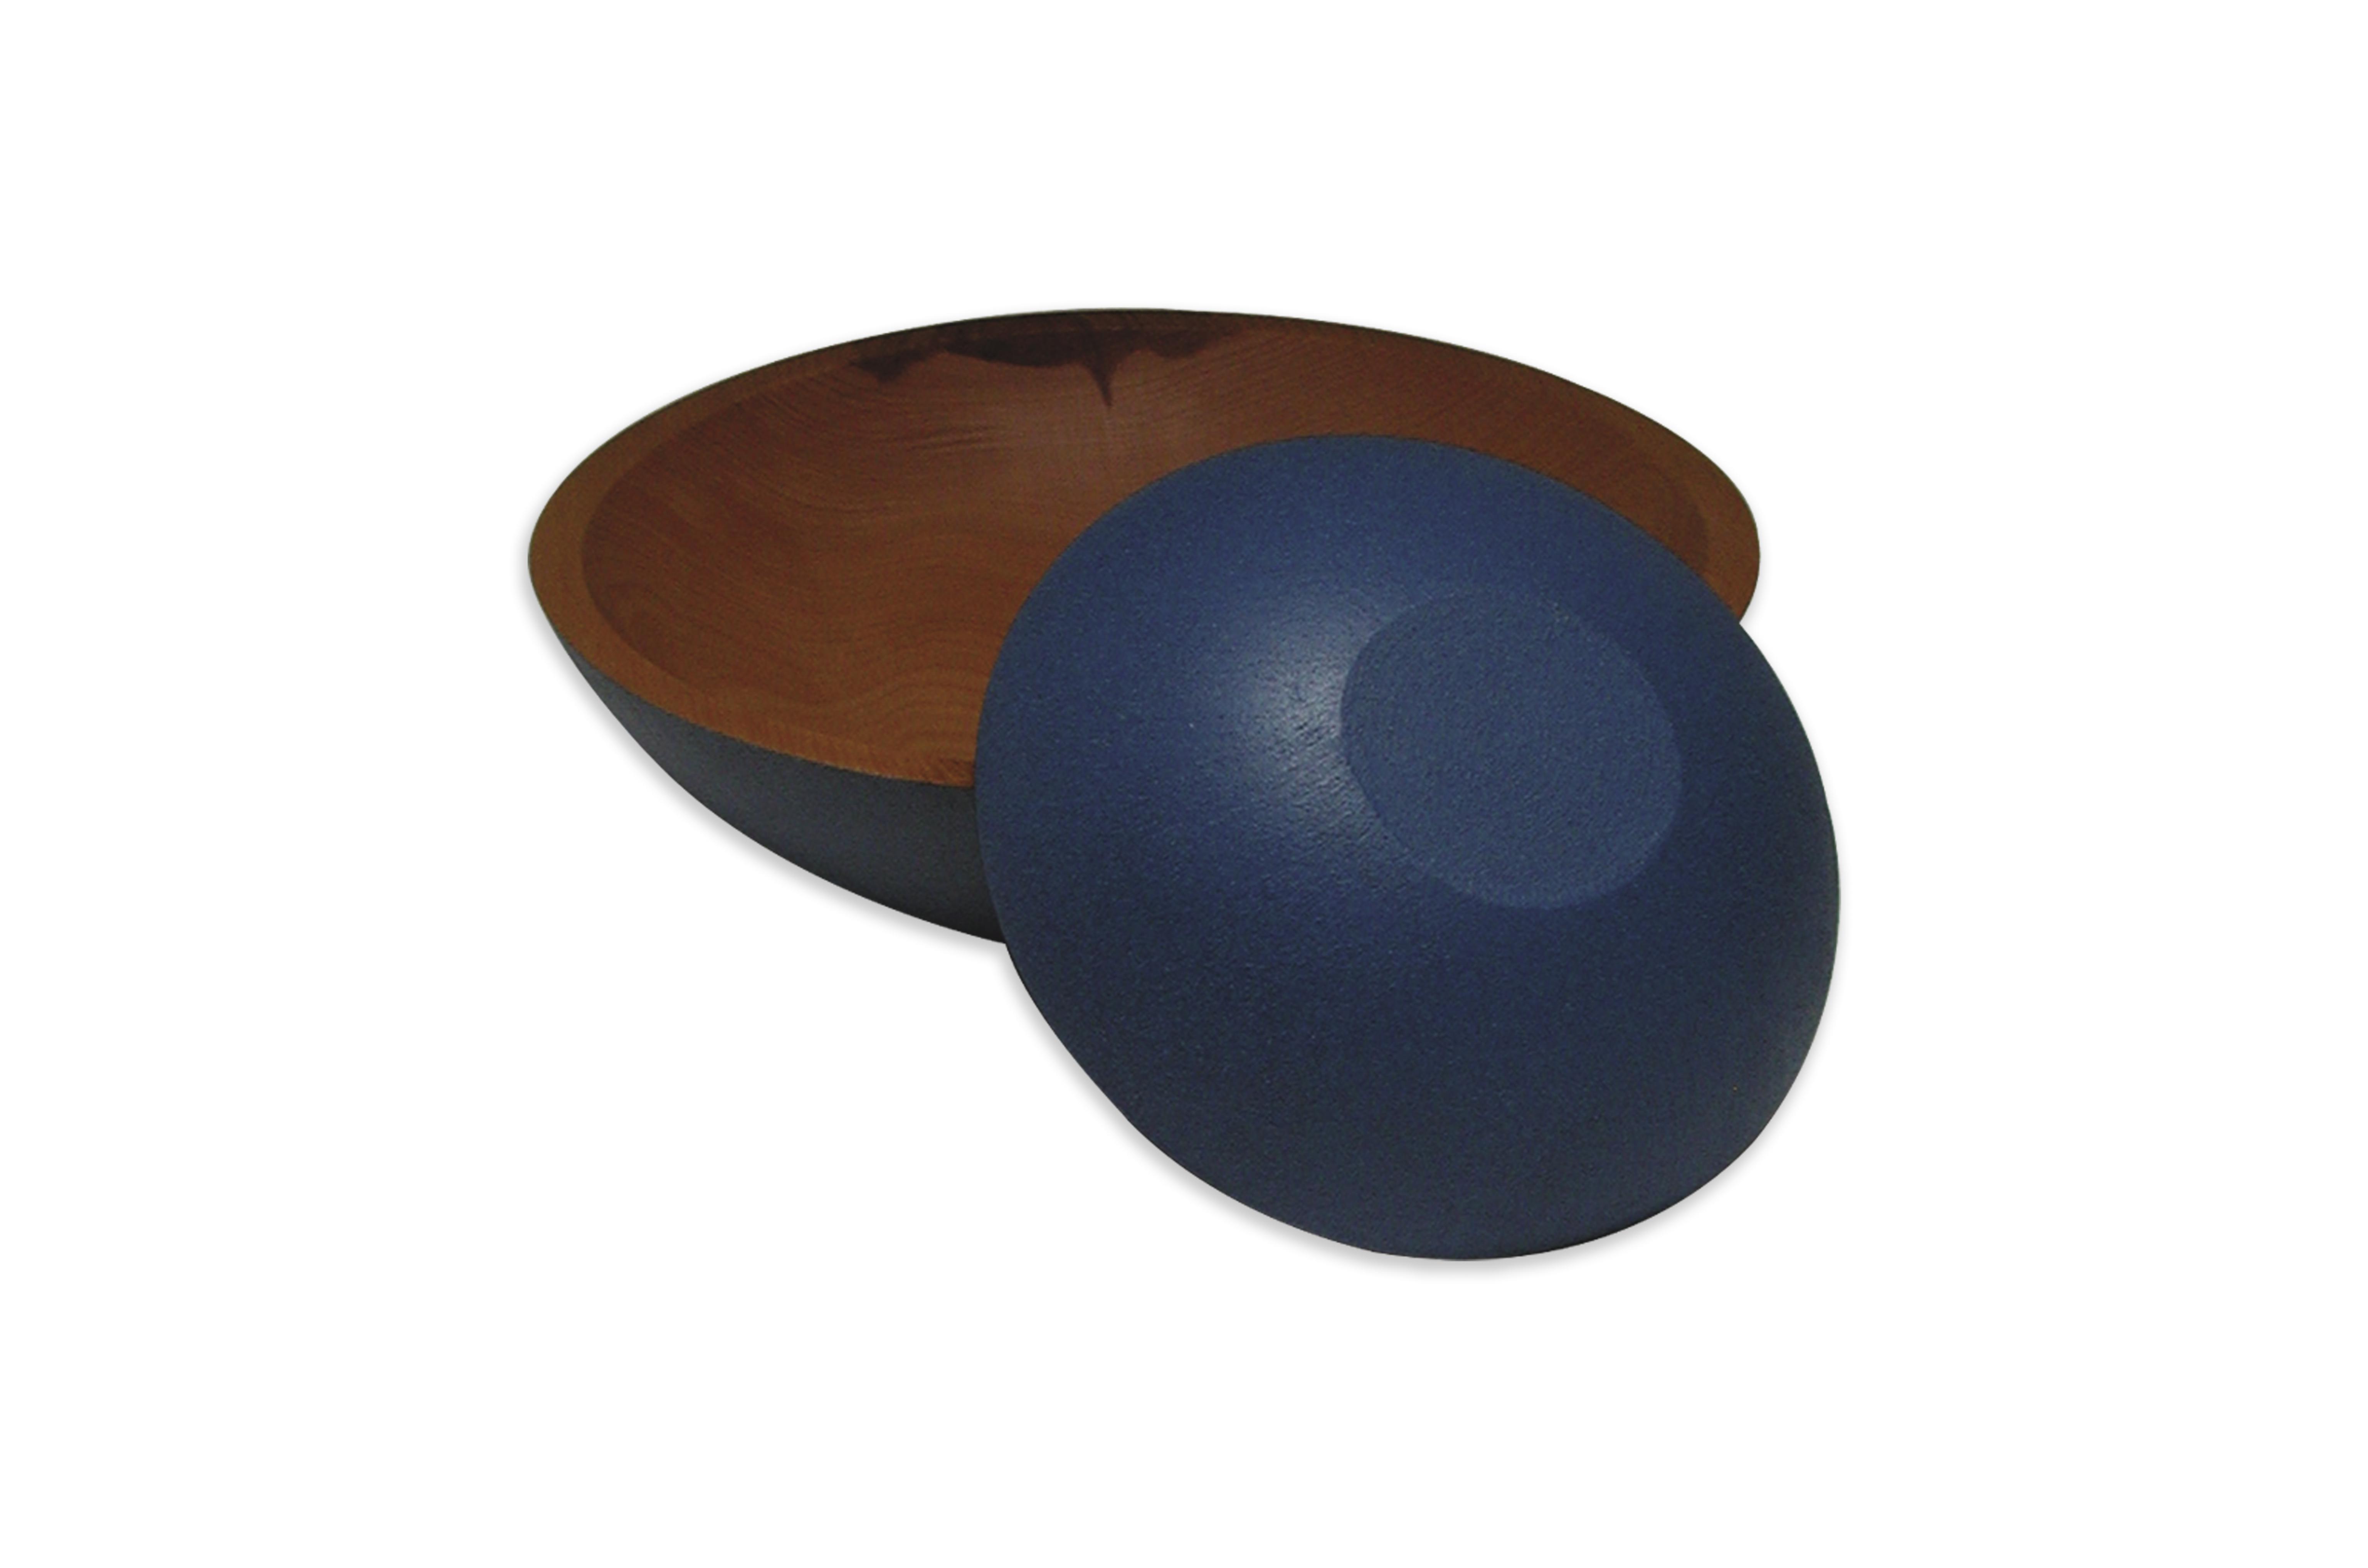 Bowls & Plates